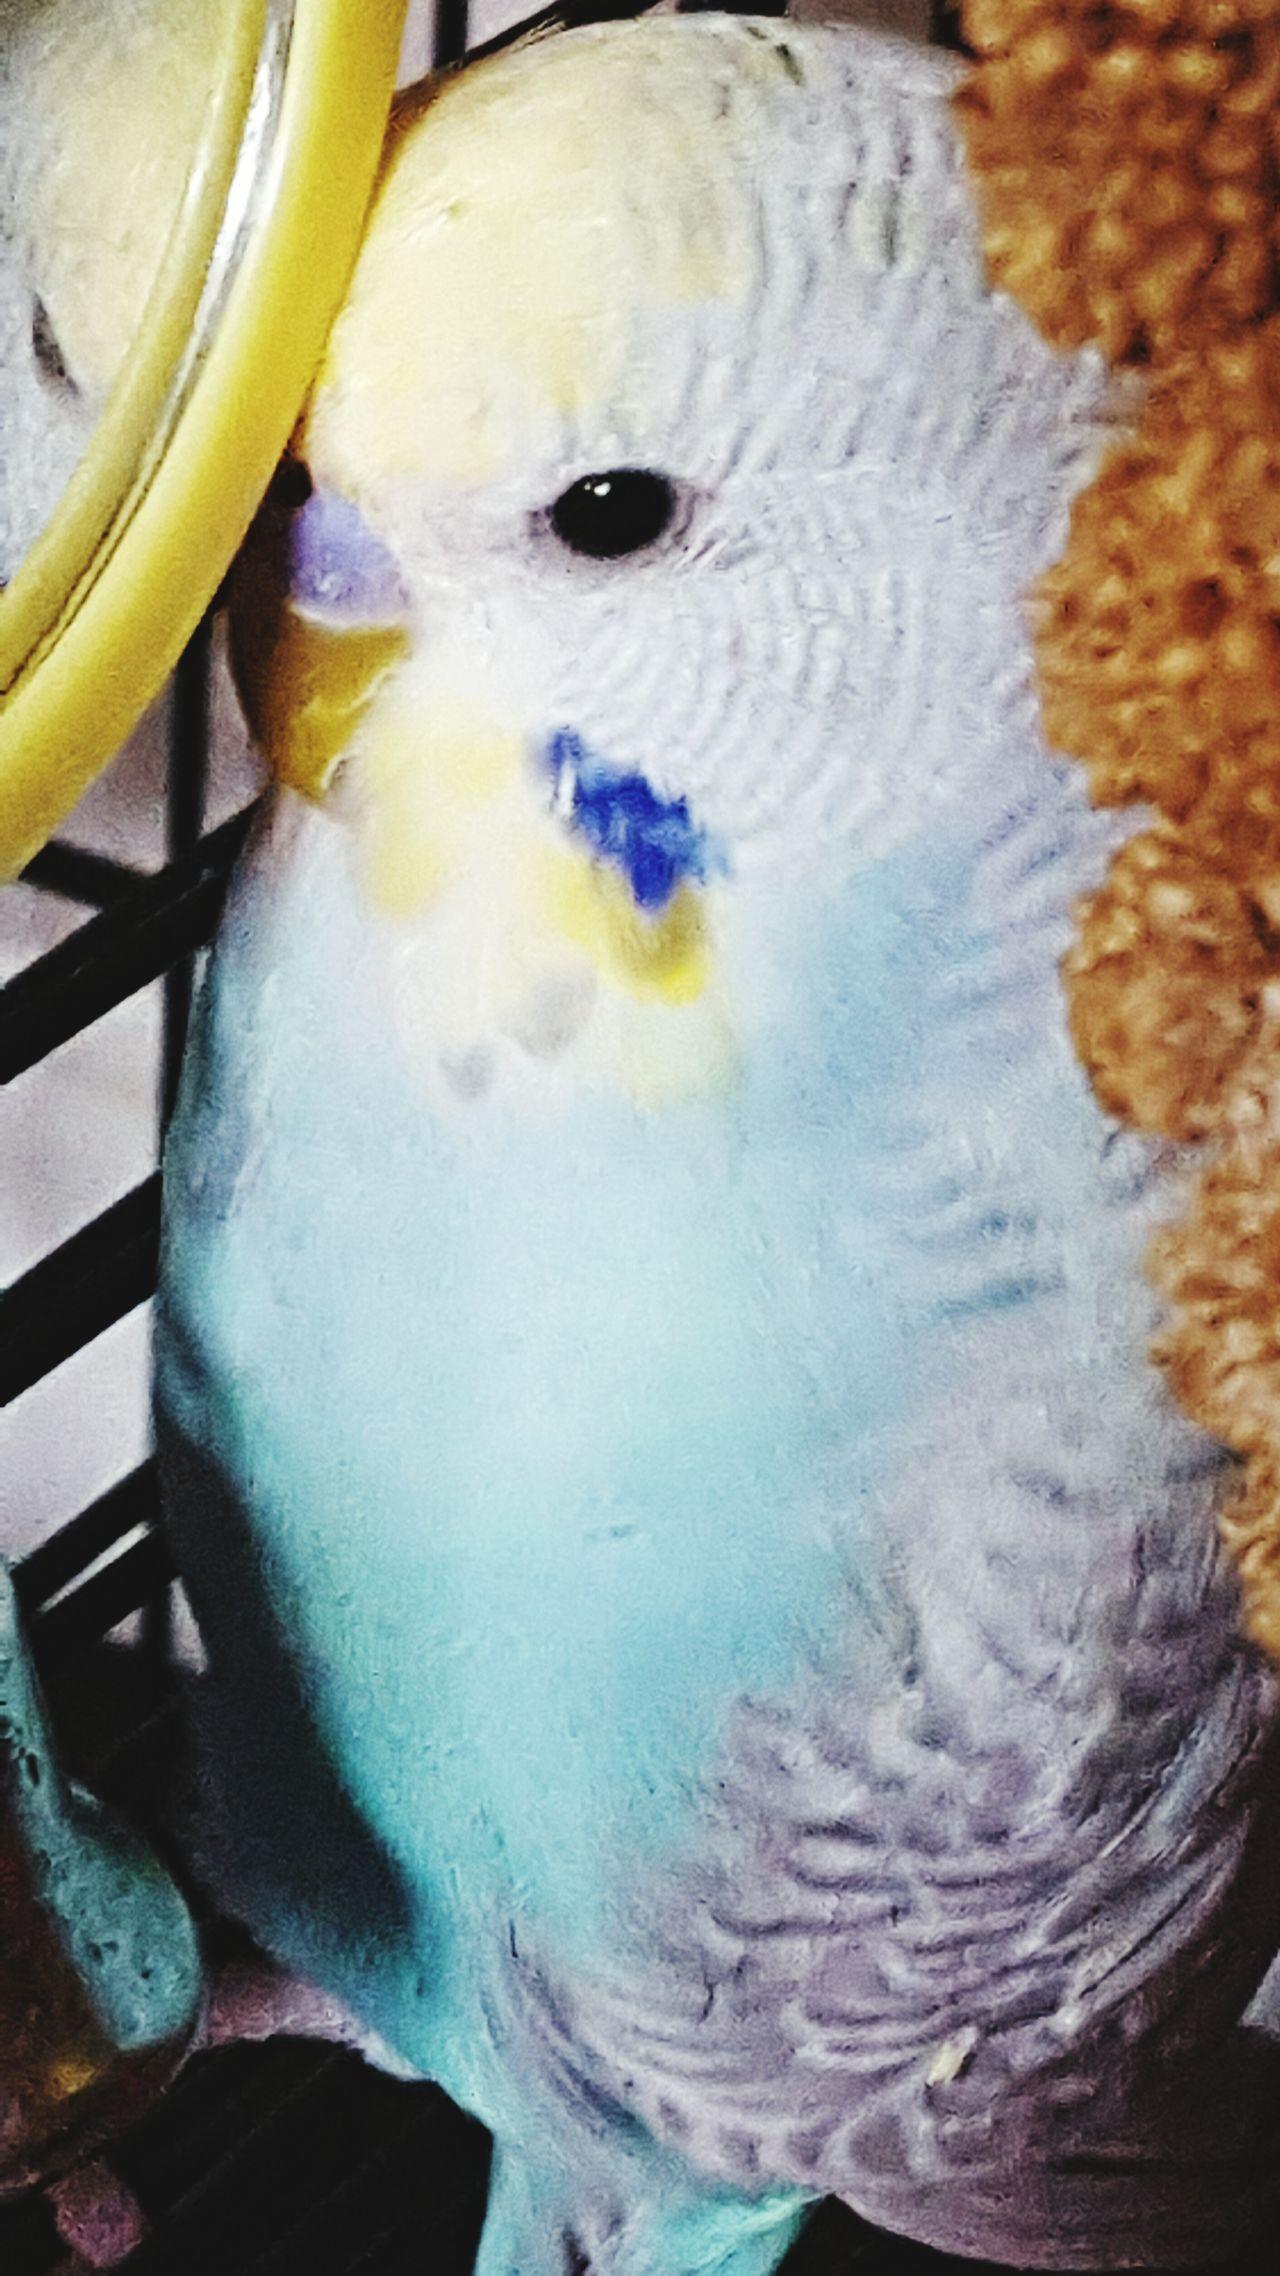 Darcy Budgielove Budgies EyeEm Birds Welovebudgies Birds_collection Bird Photography Our Feathered Friends Birds🐦⛅ My Pet